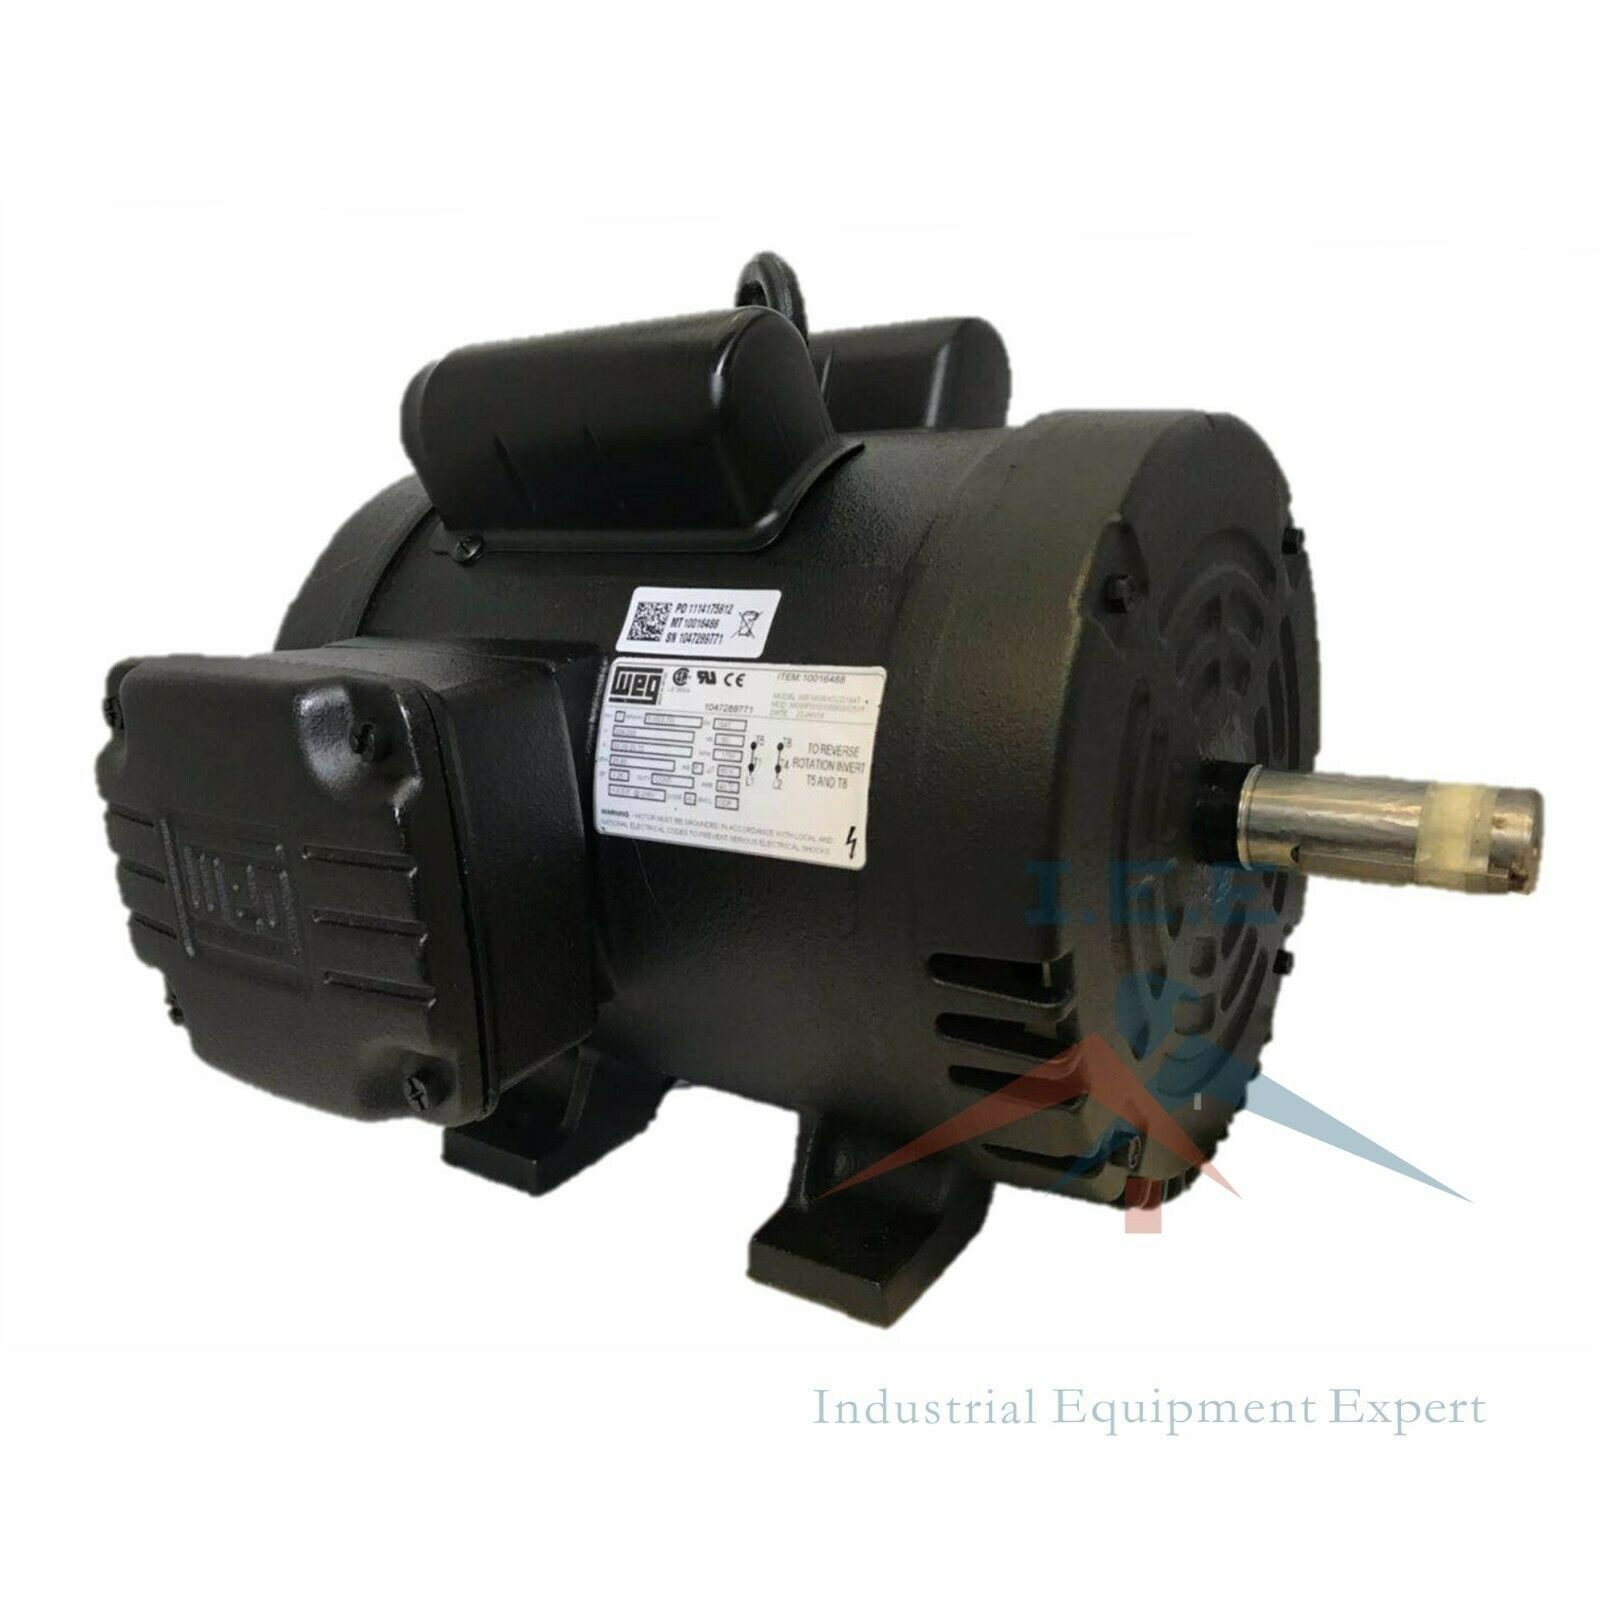 5 HP Air Compressor Duty Electric Motor 184t Frame 1750 RPM Single B Century Ac Motor Wiring Diagram on